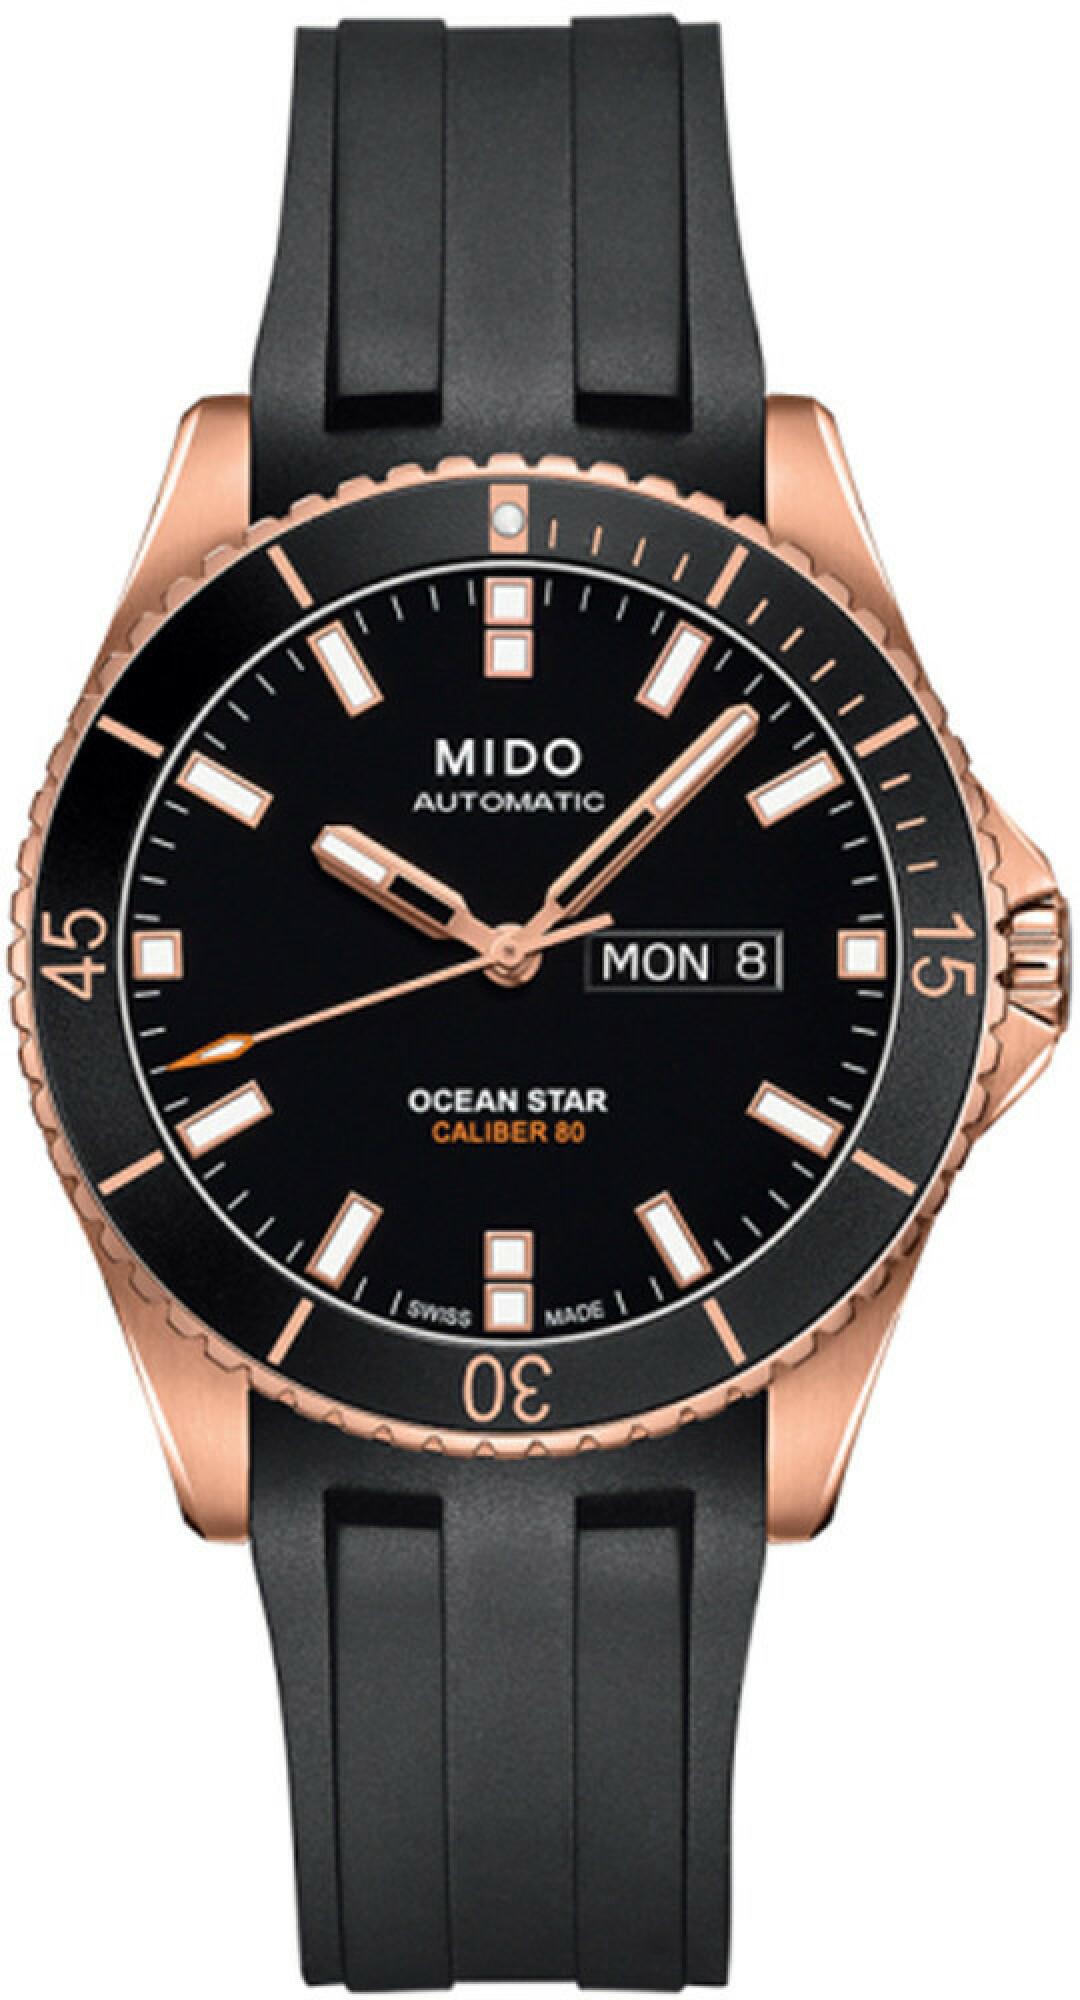 Mido M0264303705100 Sapphire Crystal Ocean Star Watch Rose-Gold/Black